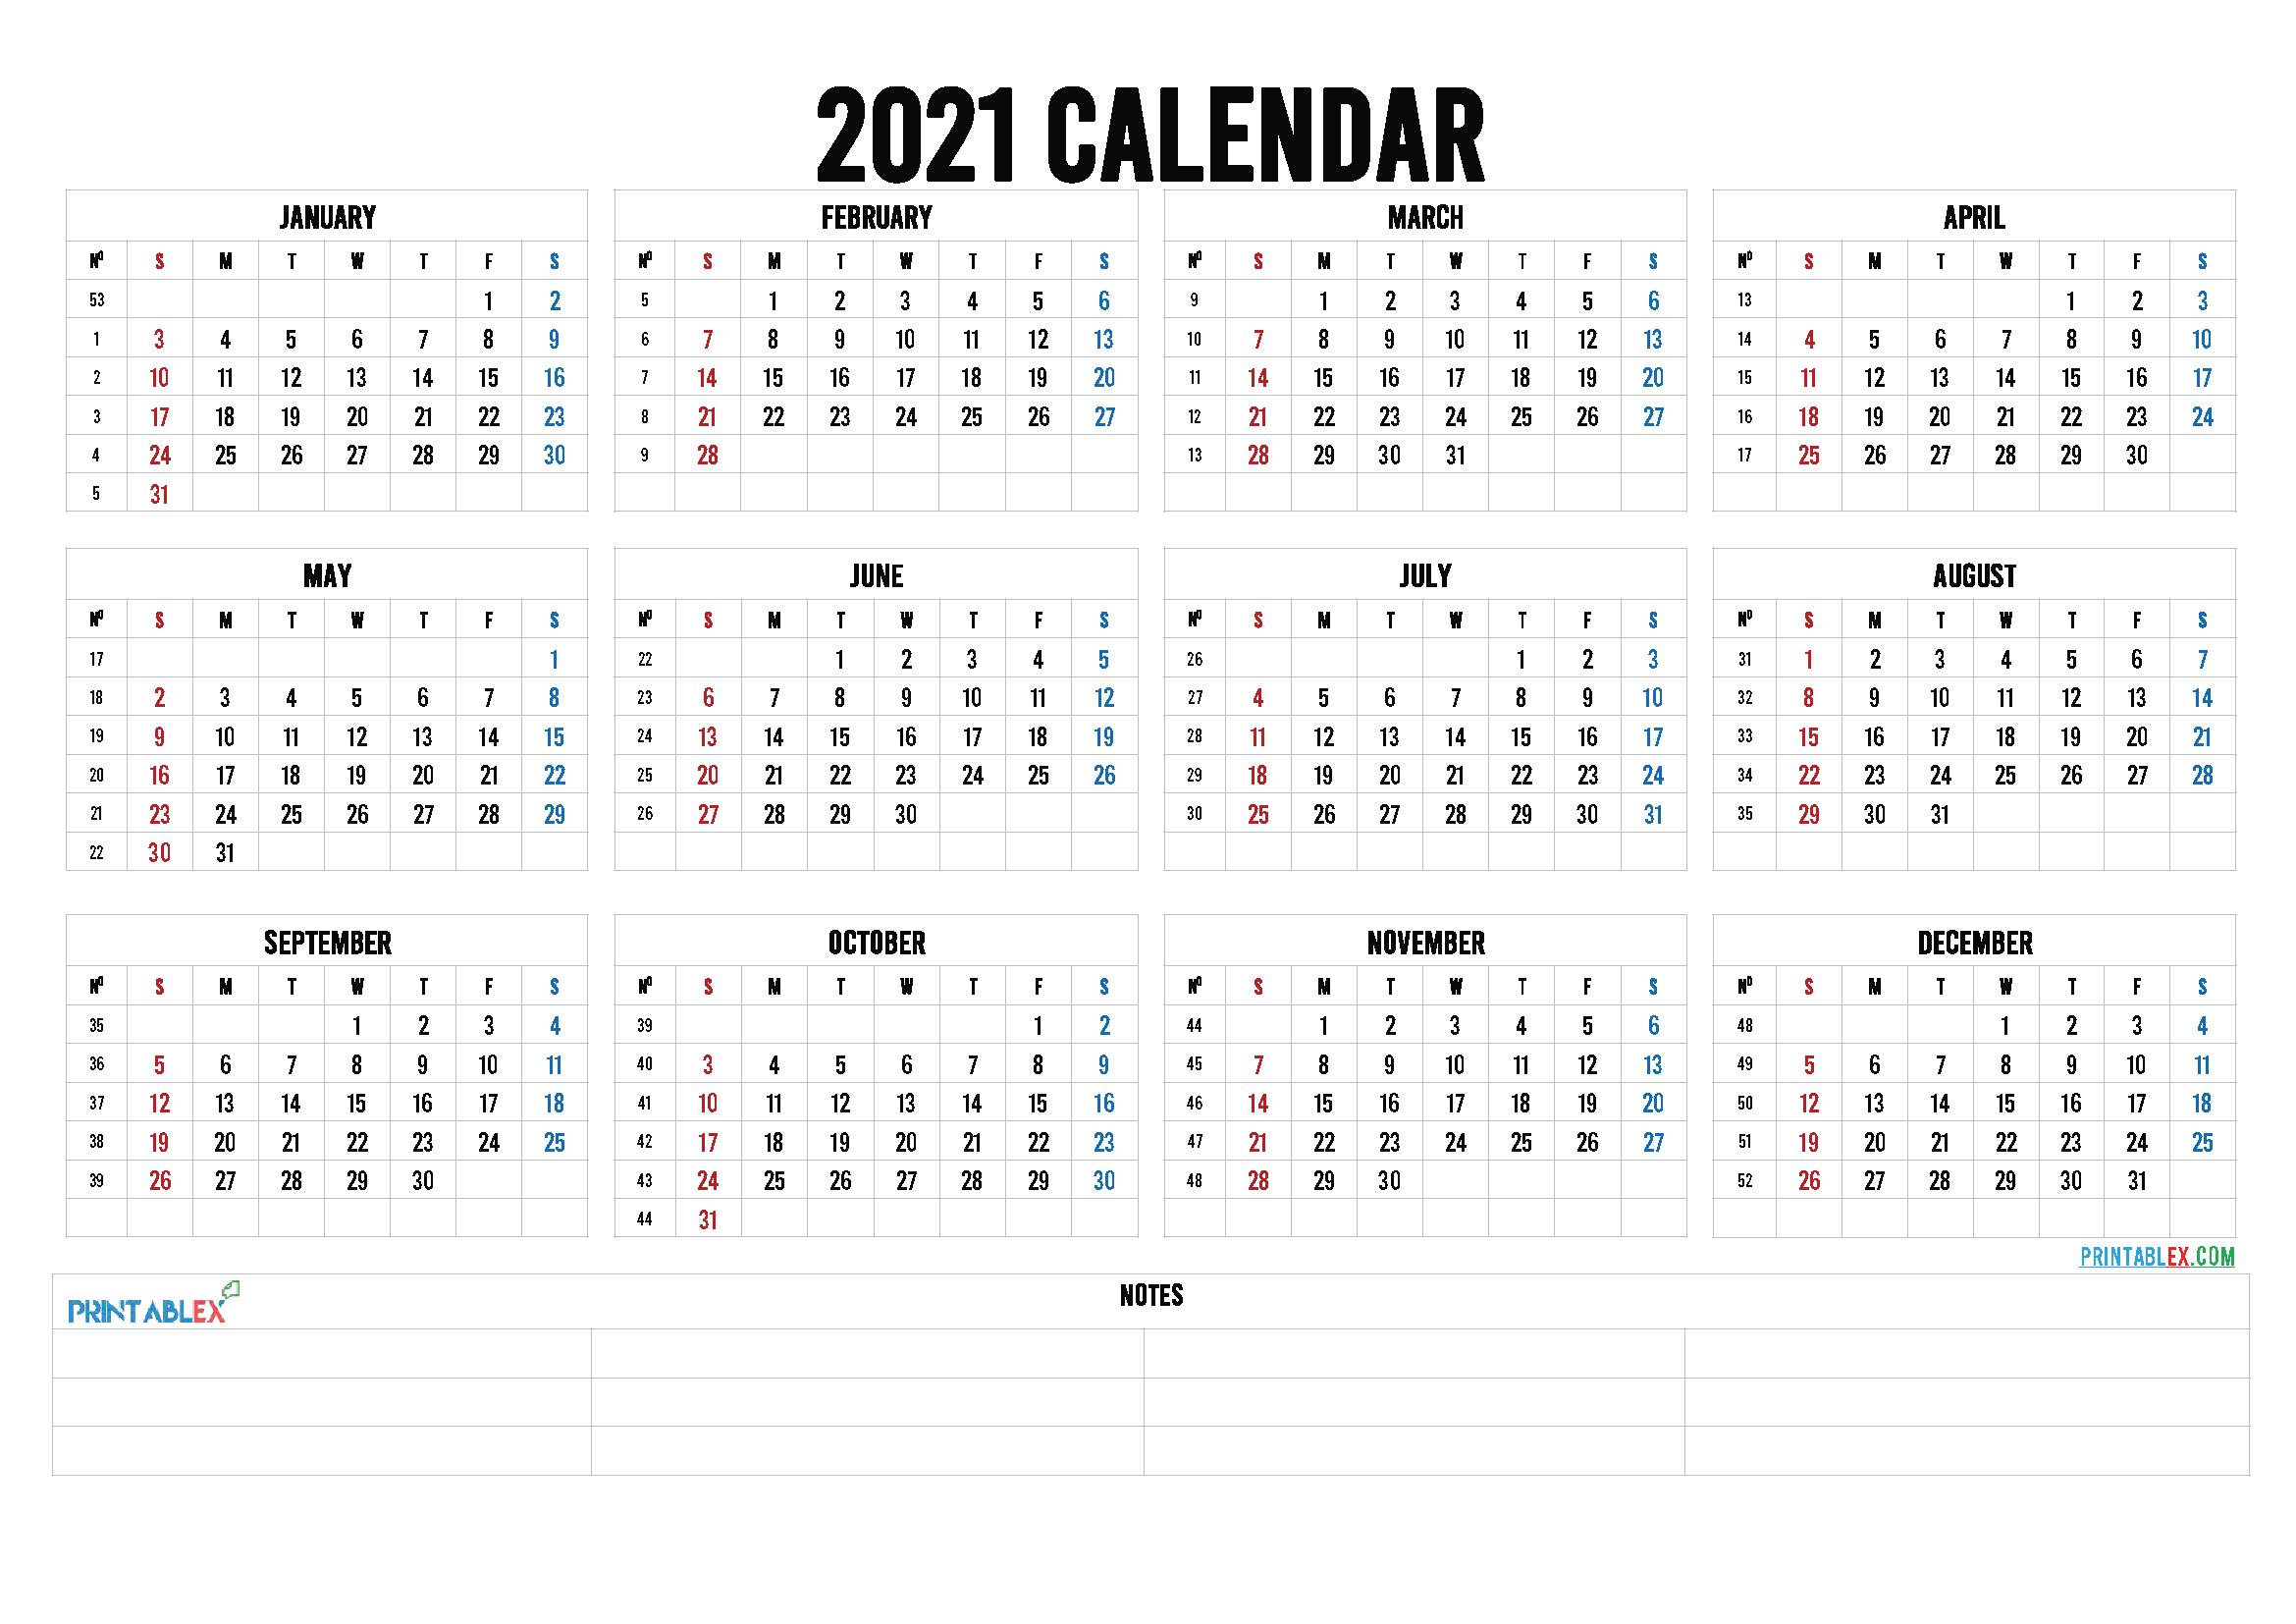 Free Editable Weekly 2021 Calendar : Custom Editable 2021